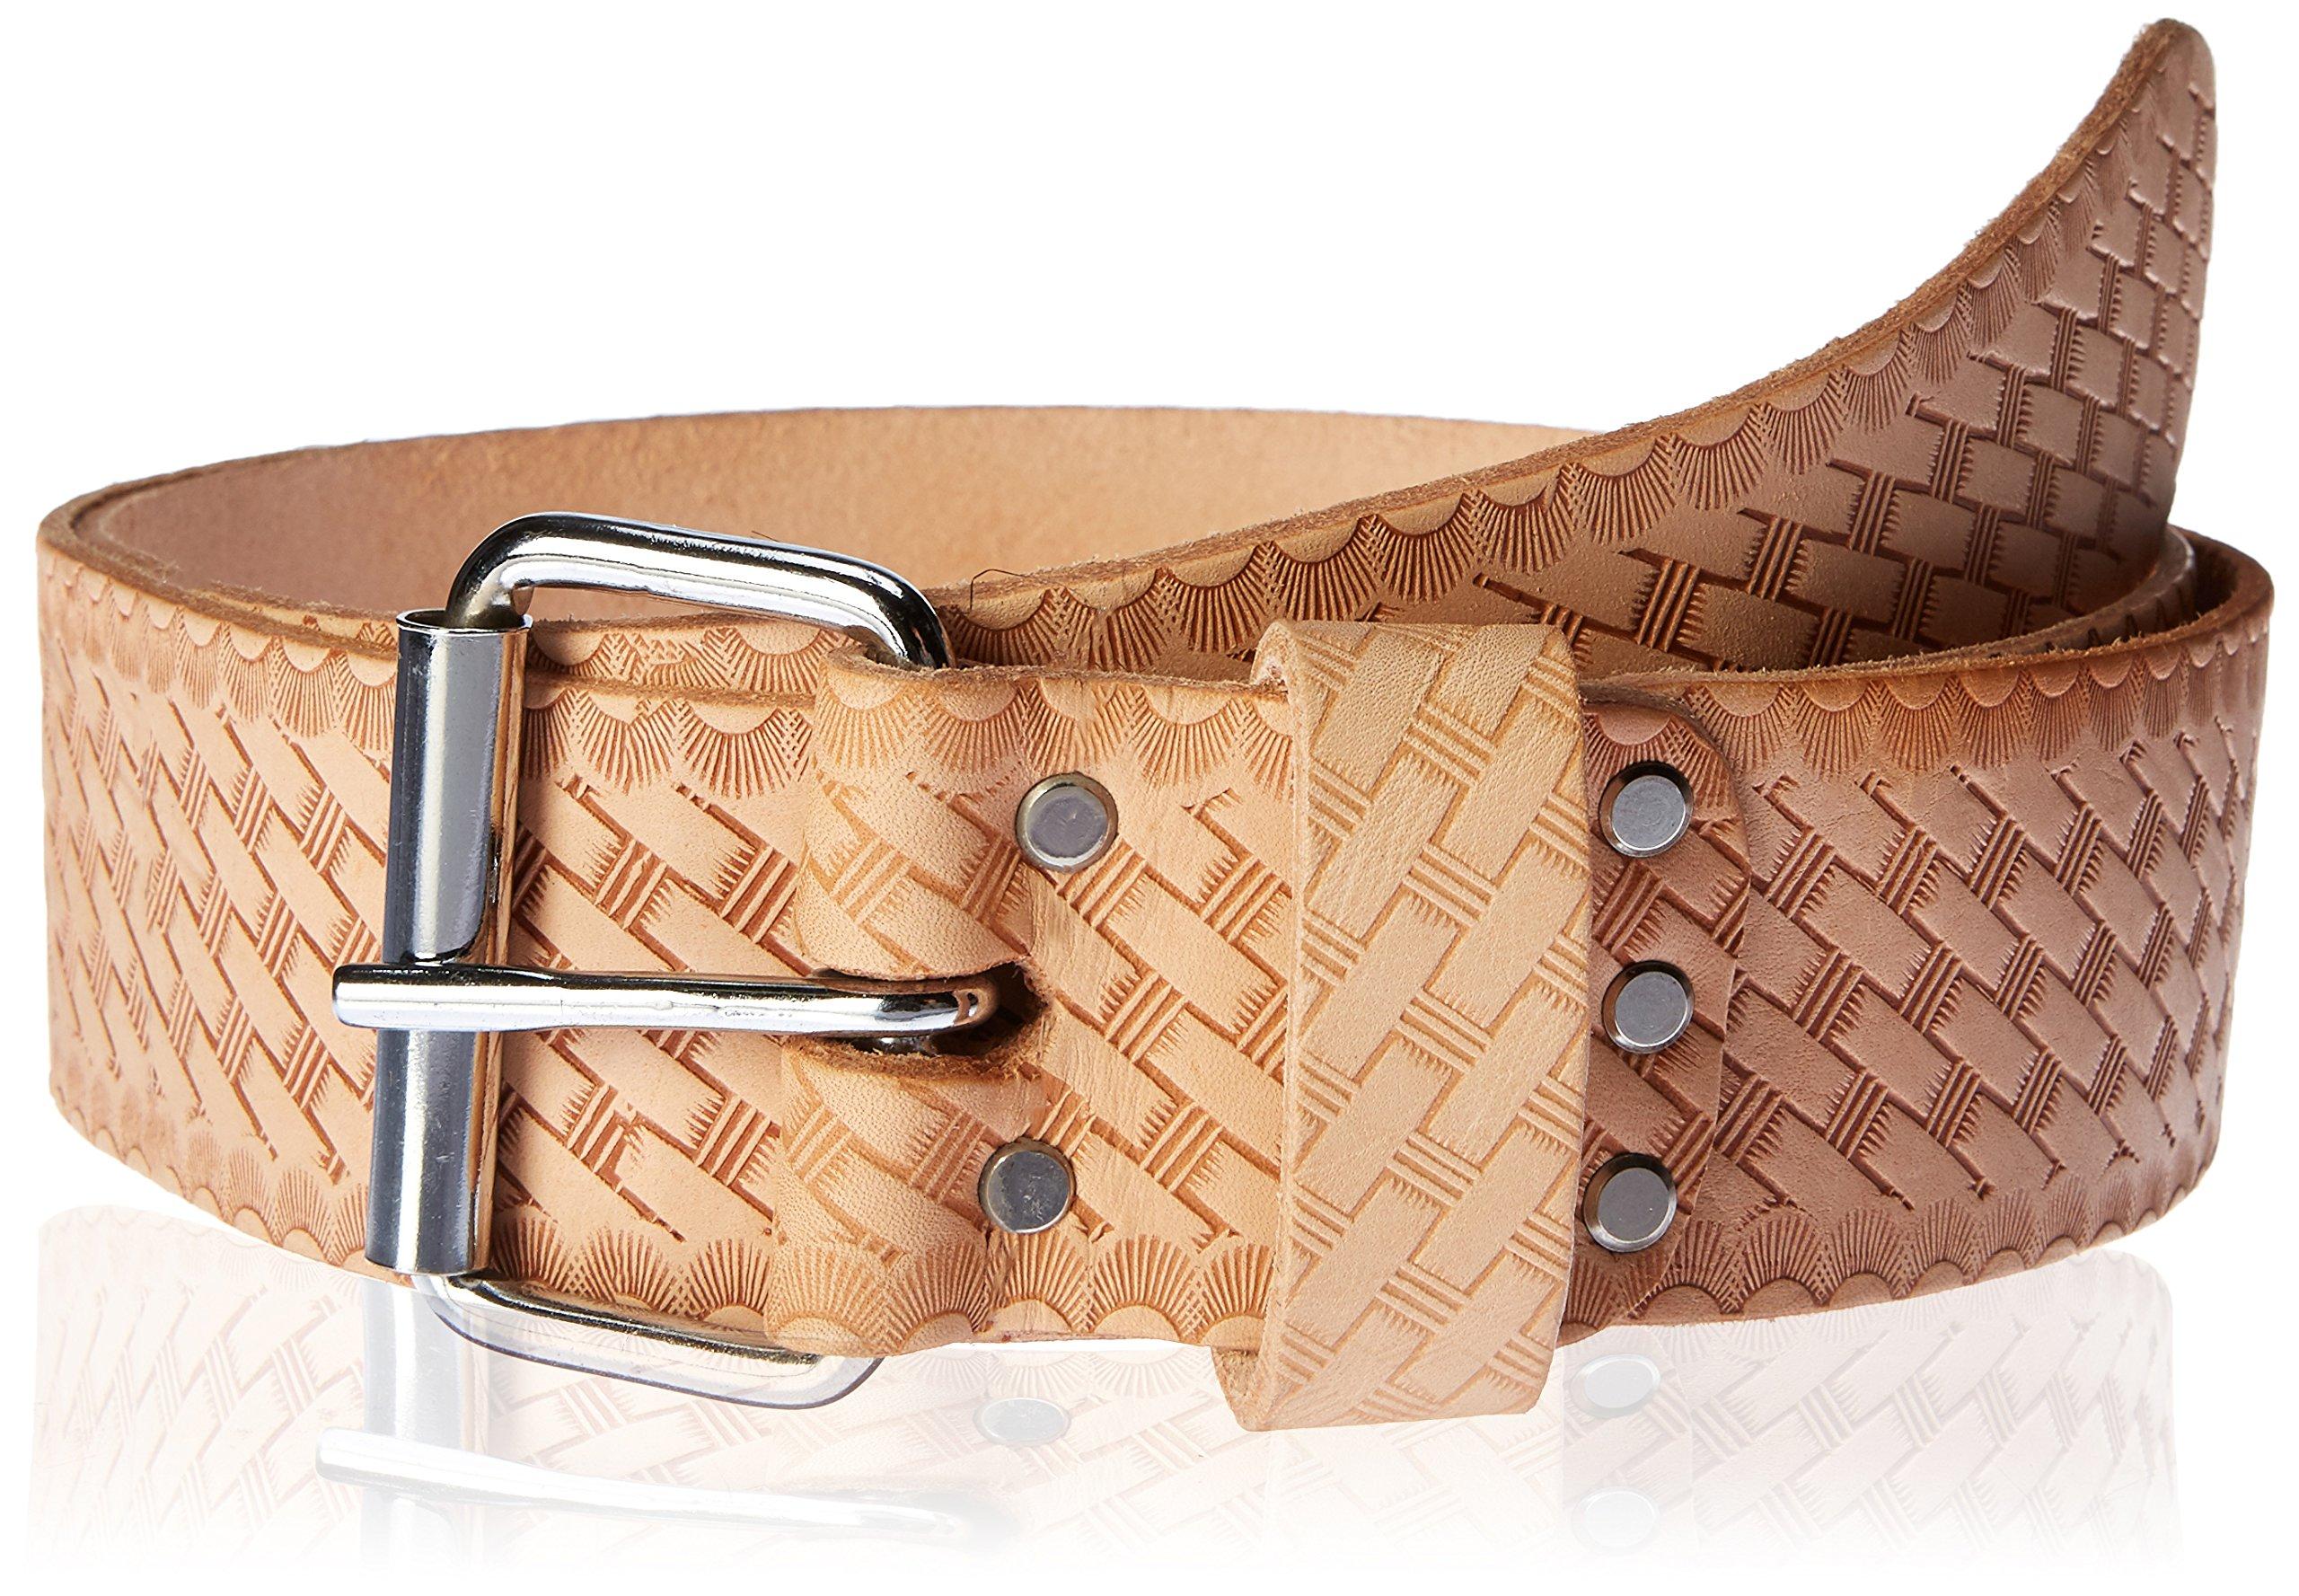 Modestone Western Unisex Leather Belt 1.5 Width 1//8 Thick Black